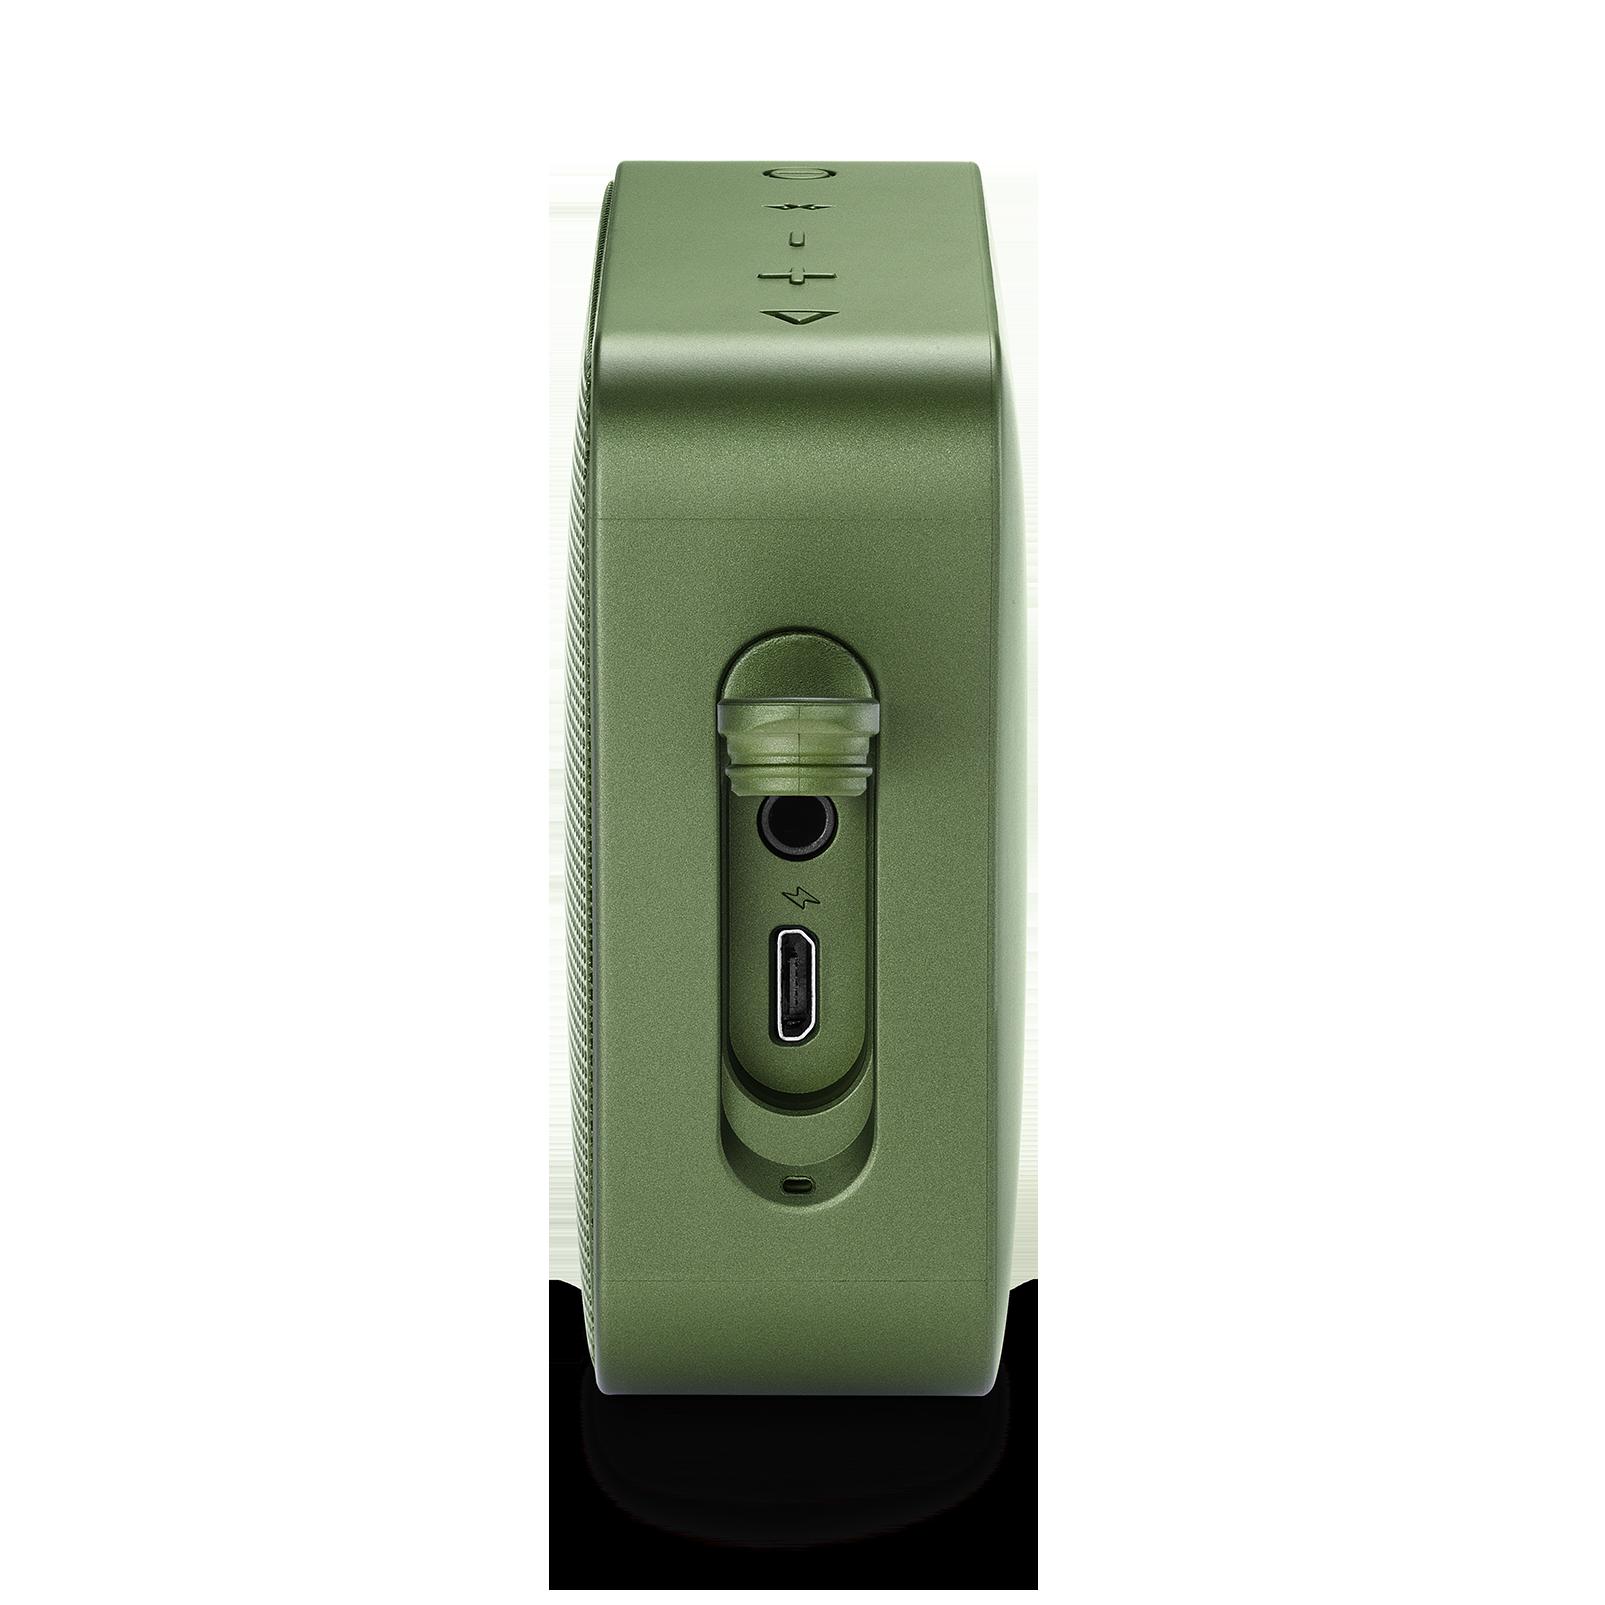 JBL GO 2 - Moss Green - Portable Bluetooth speaker - Detailshot 4